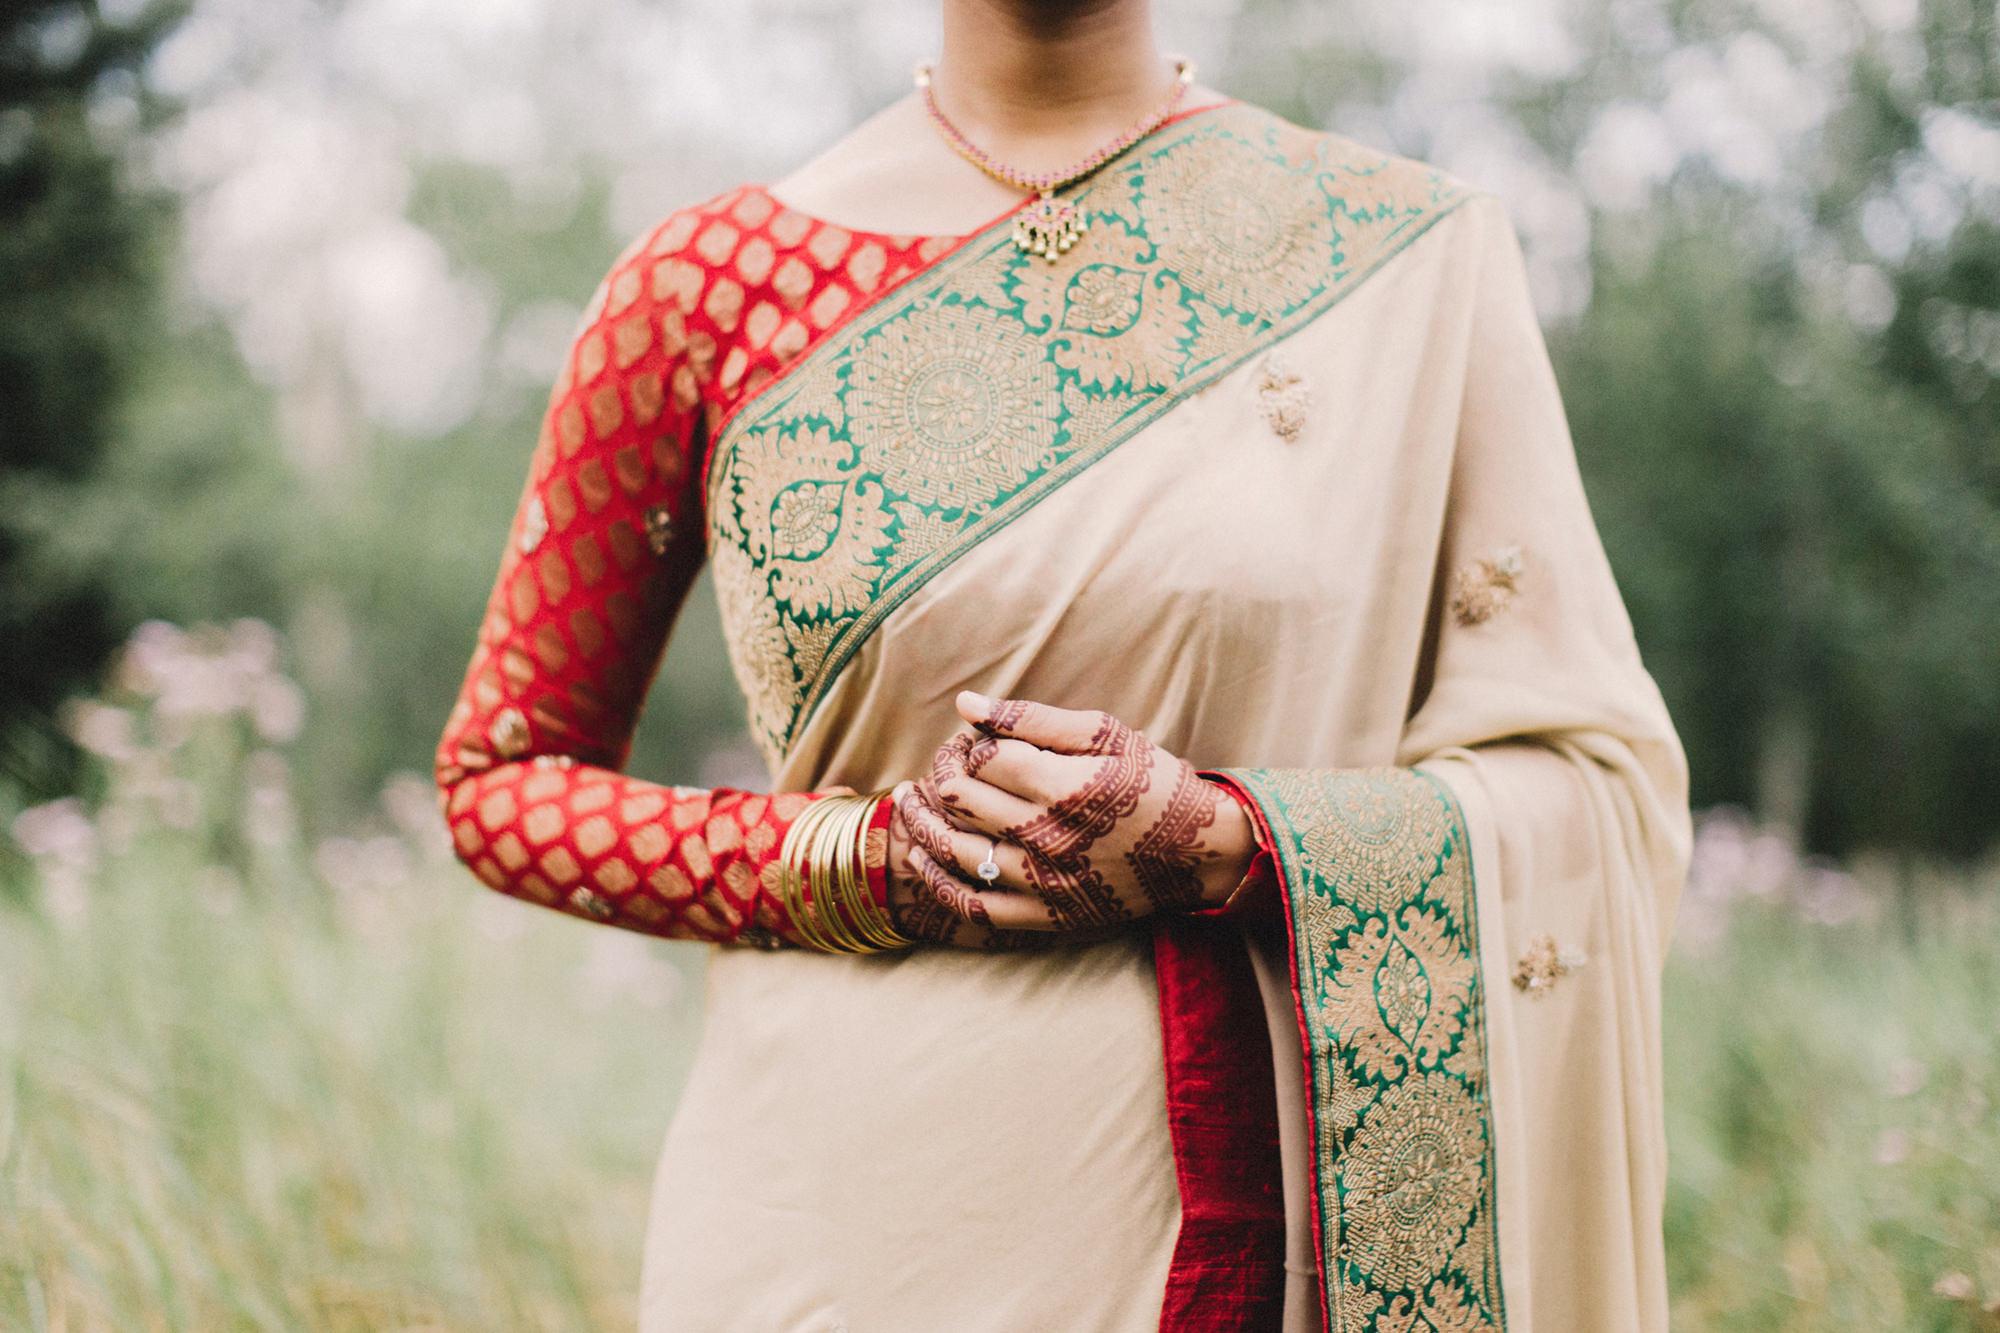 banff wedding, indian wedding, mountain wedding, small mountain wedding, banff wedding photographer, canmore wedding photographer